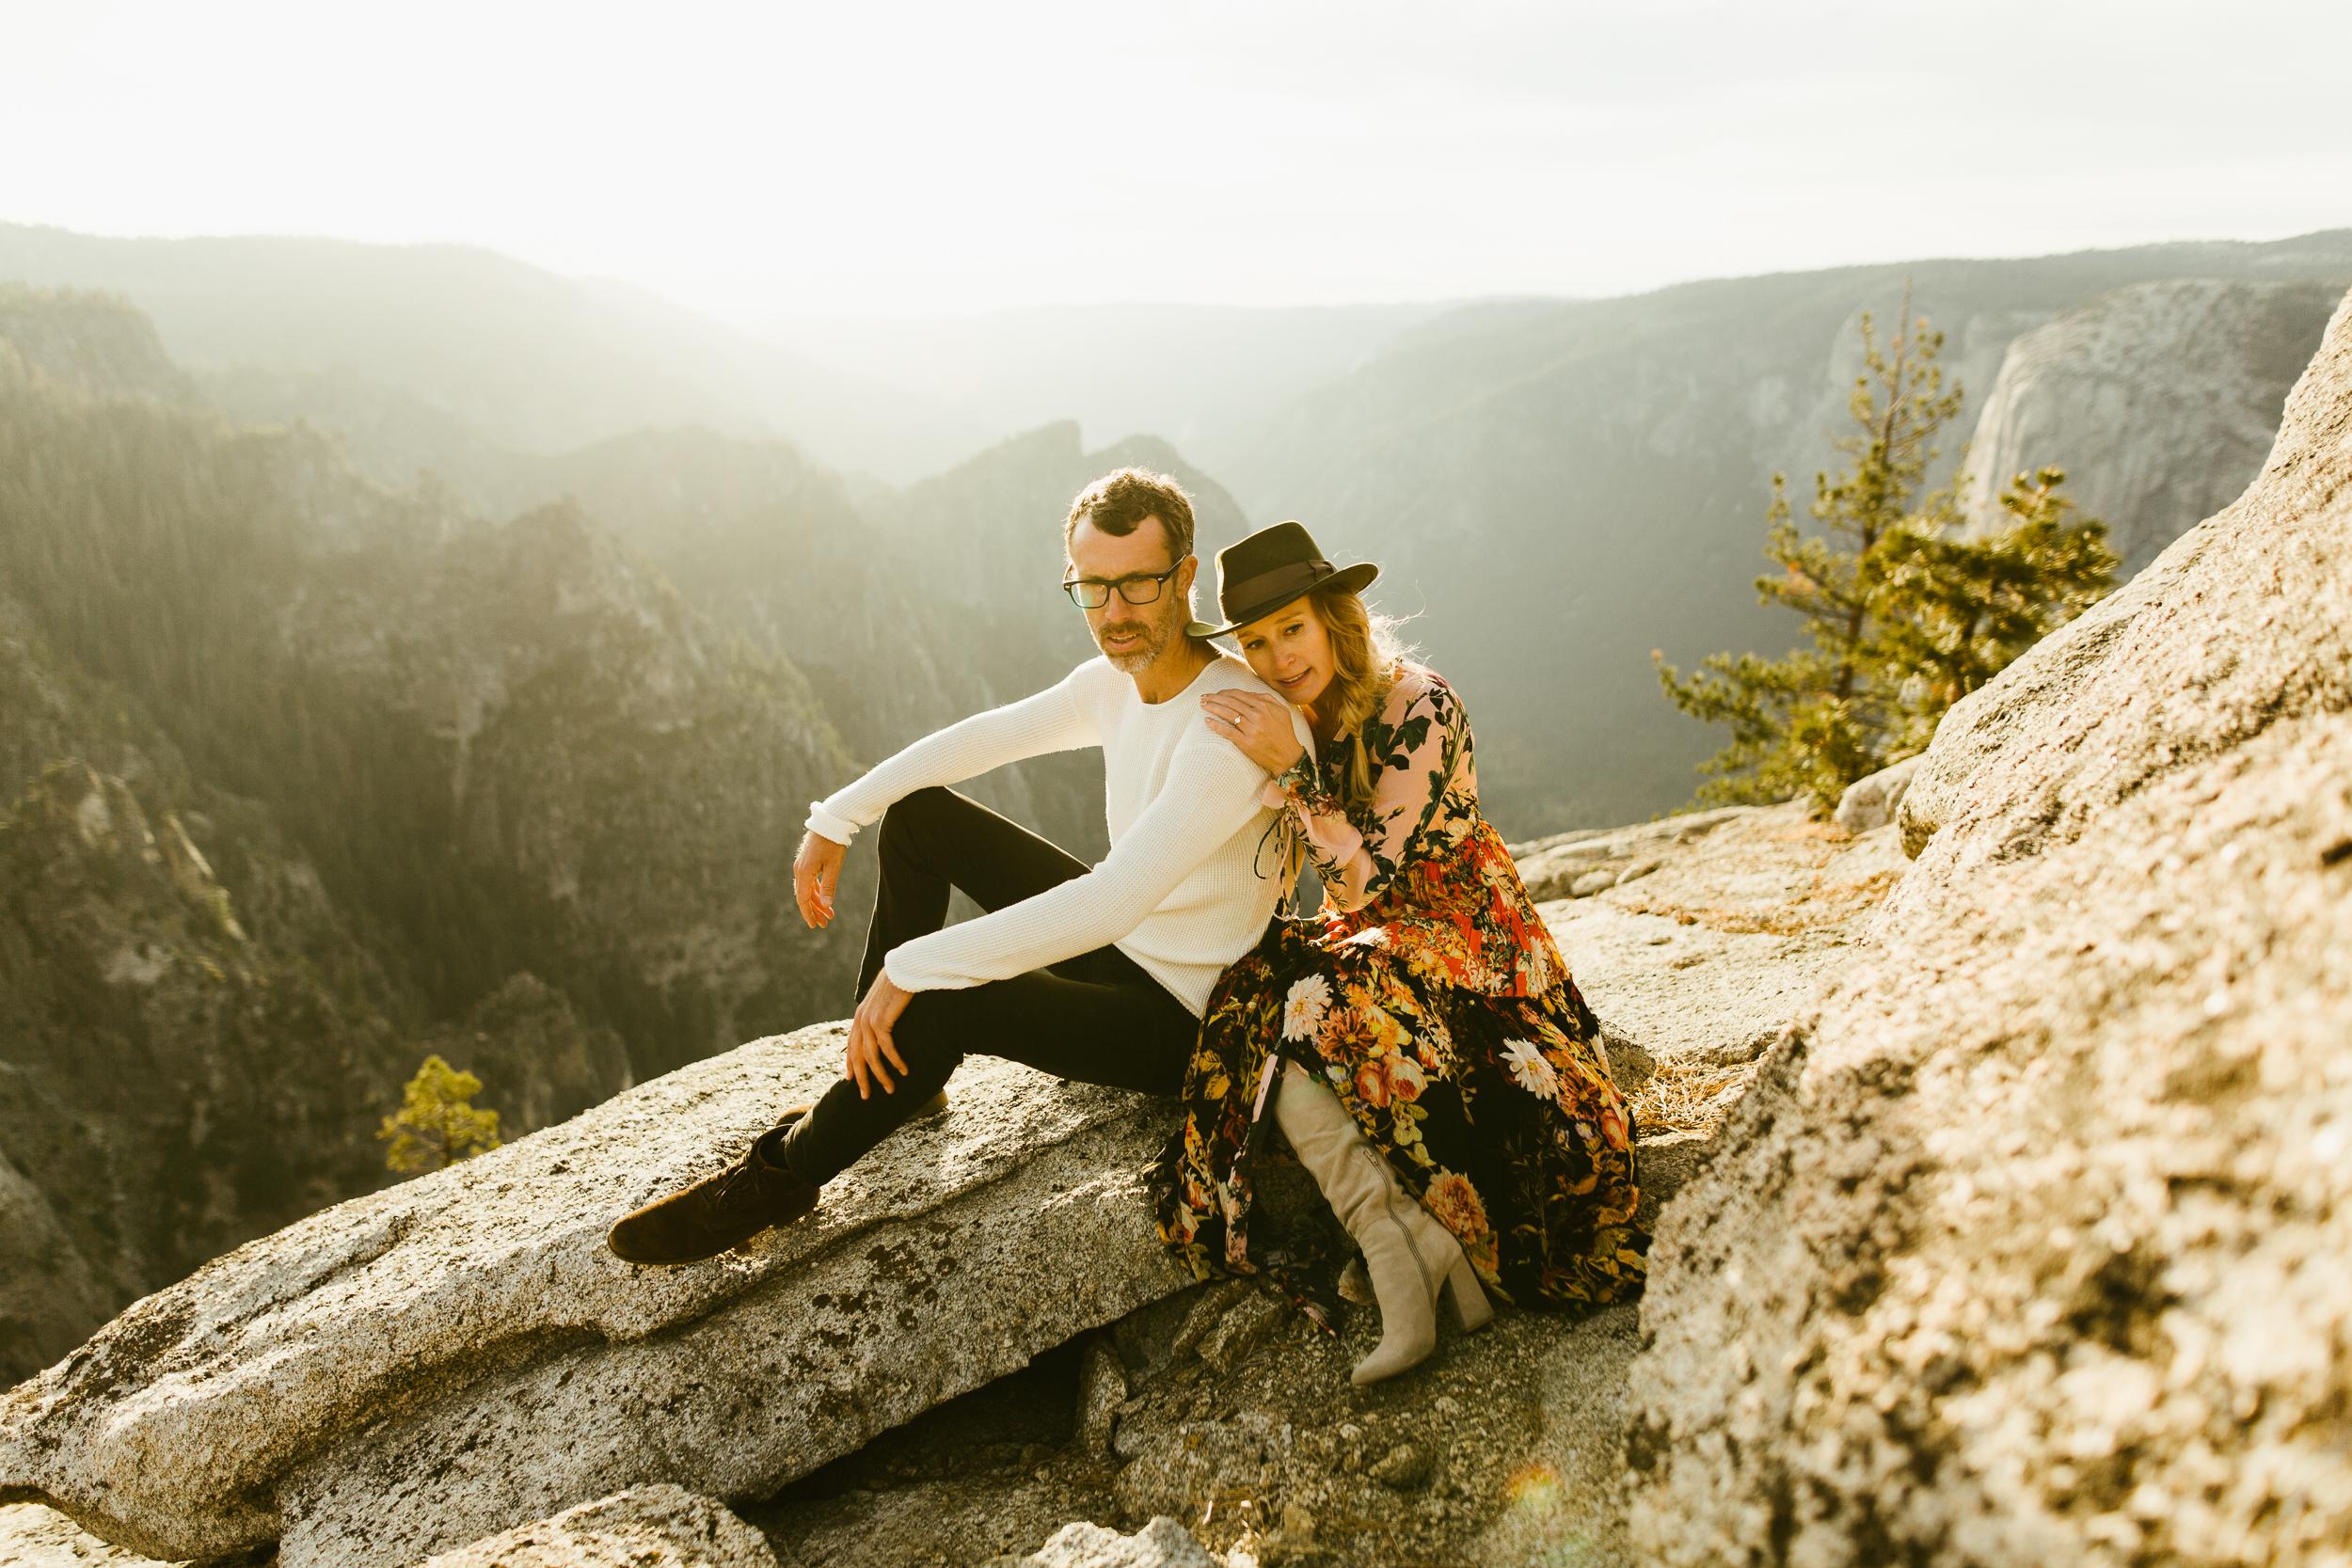 YosemiteElopementPhotographyJacquesFlynnLisaKarst18.jpg